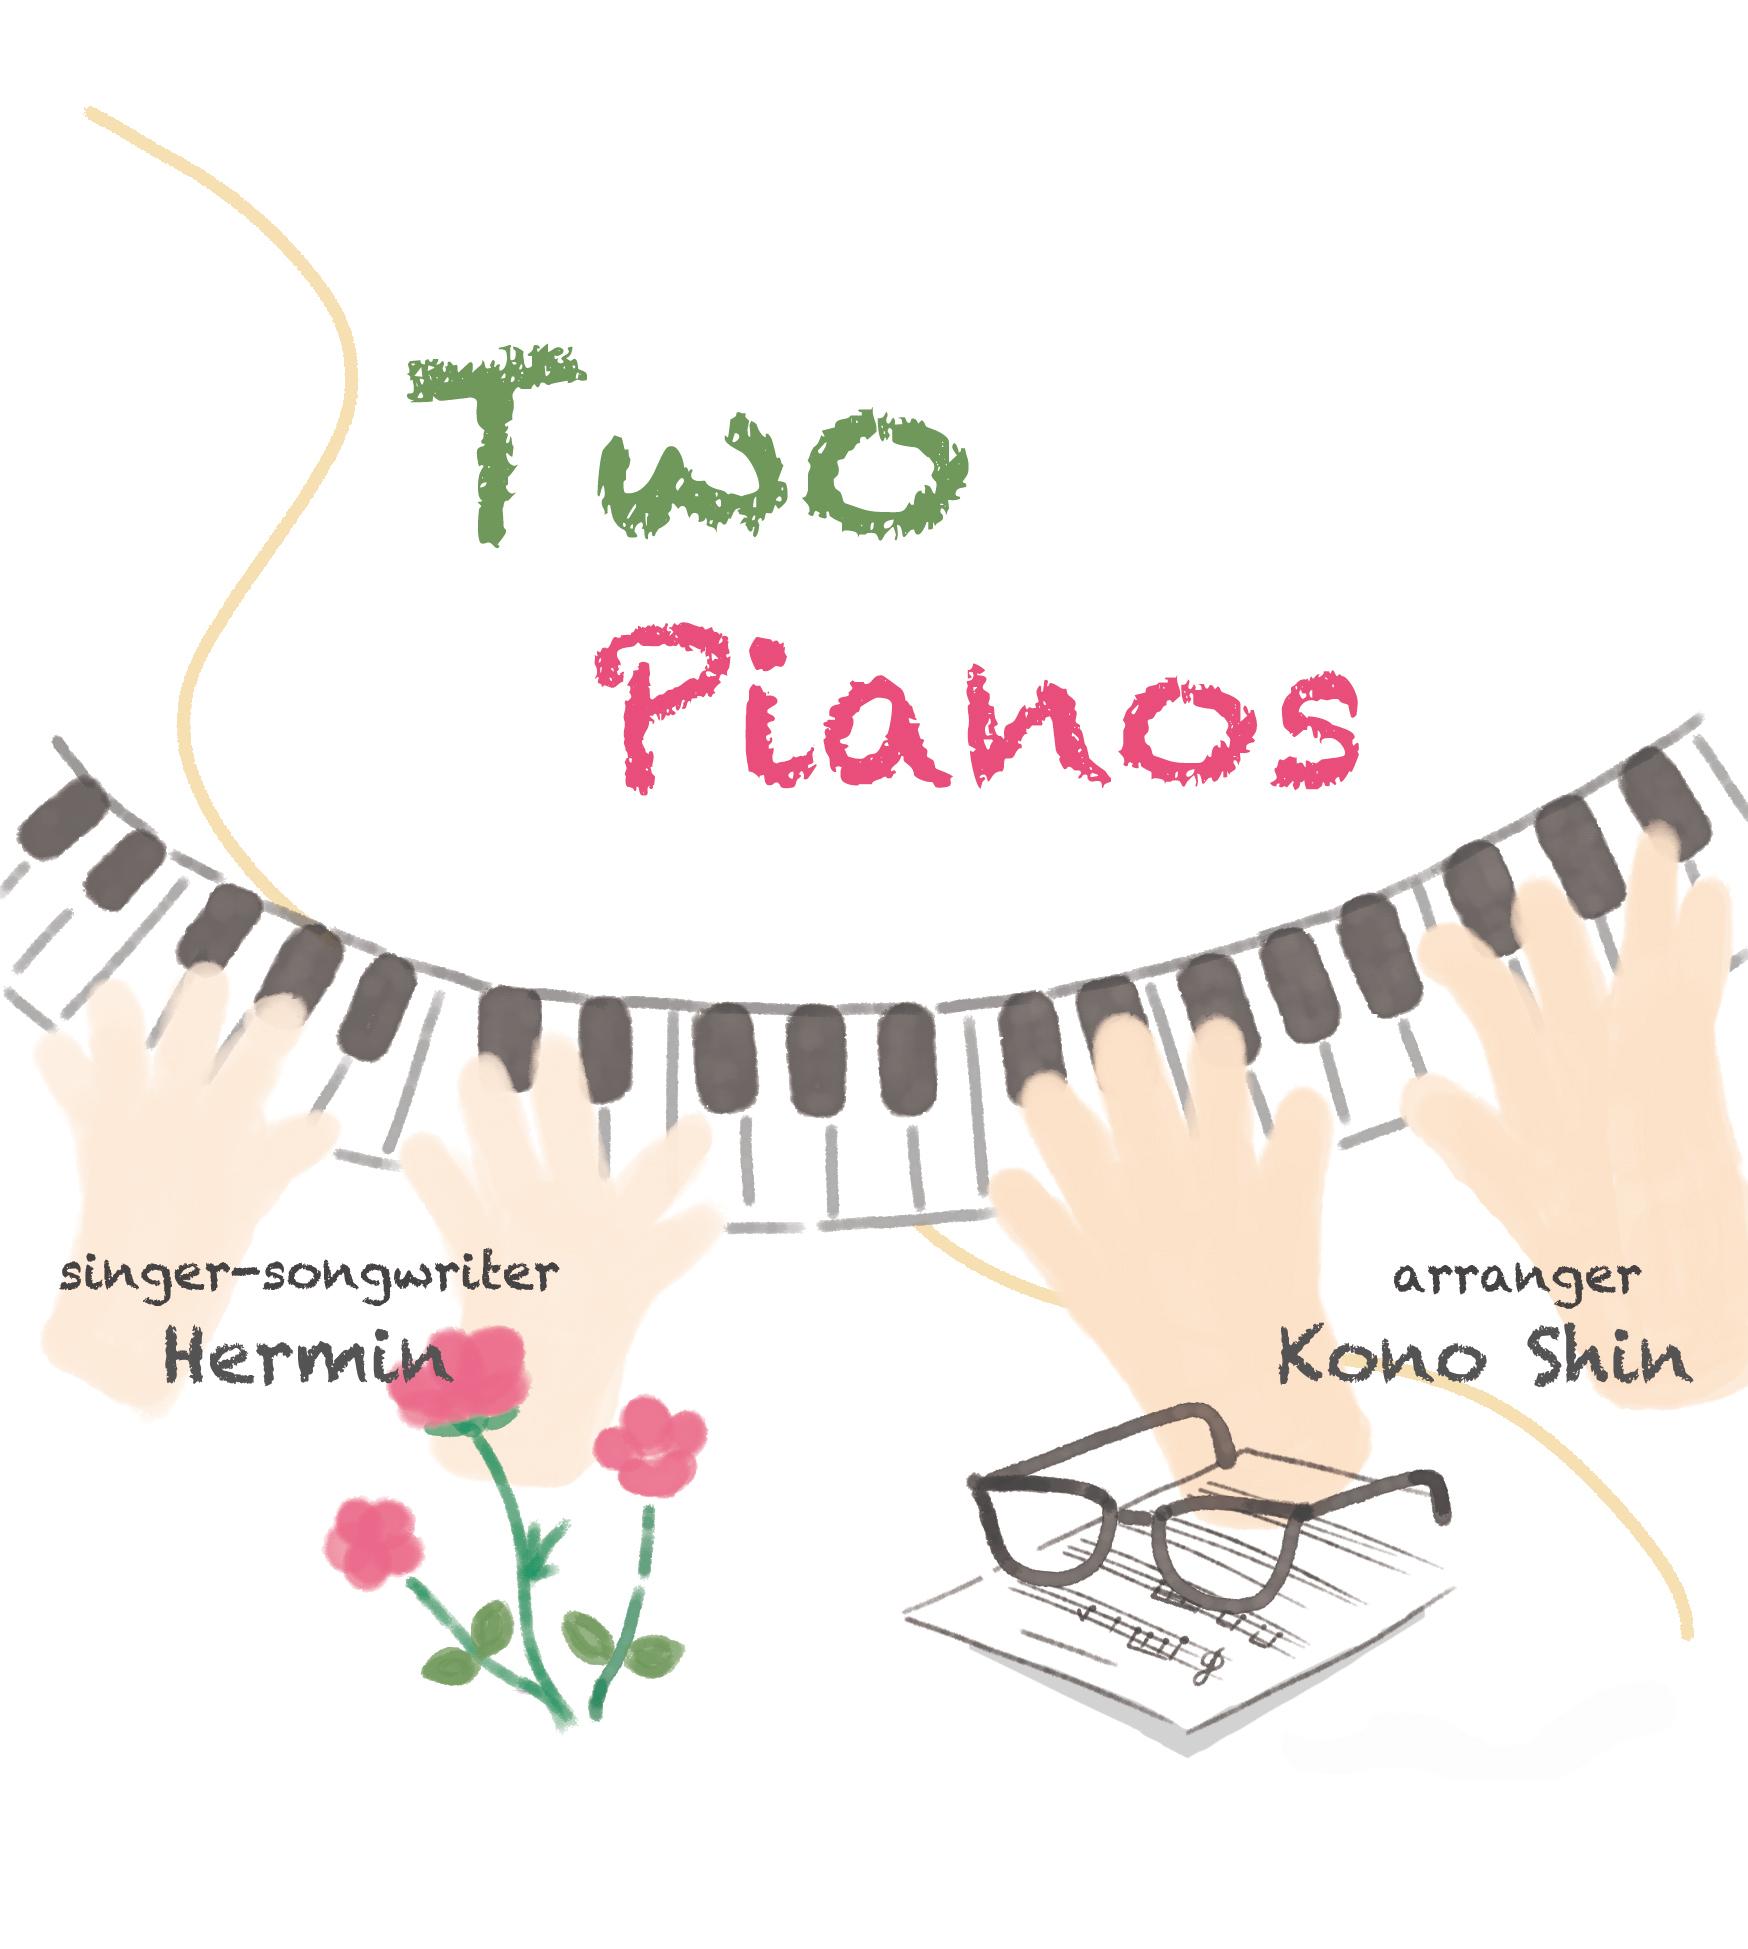 salon de Hermin vol.2 Two Pianos